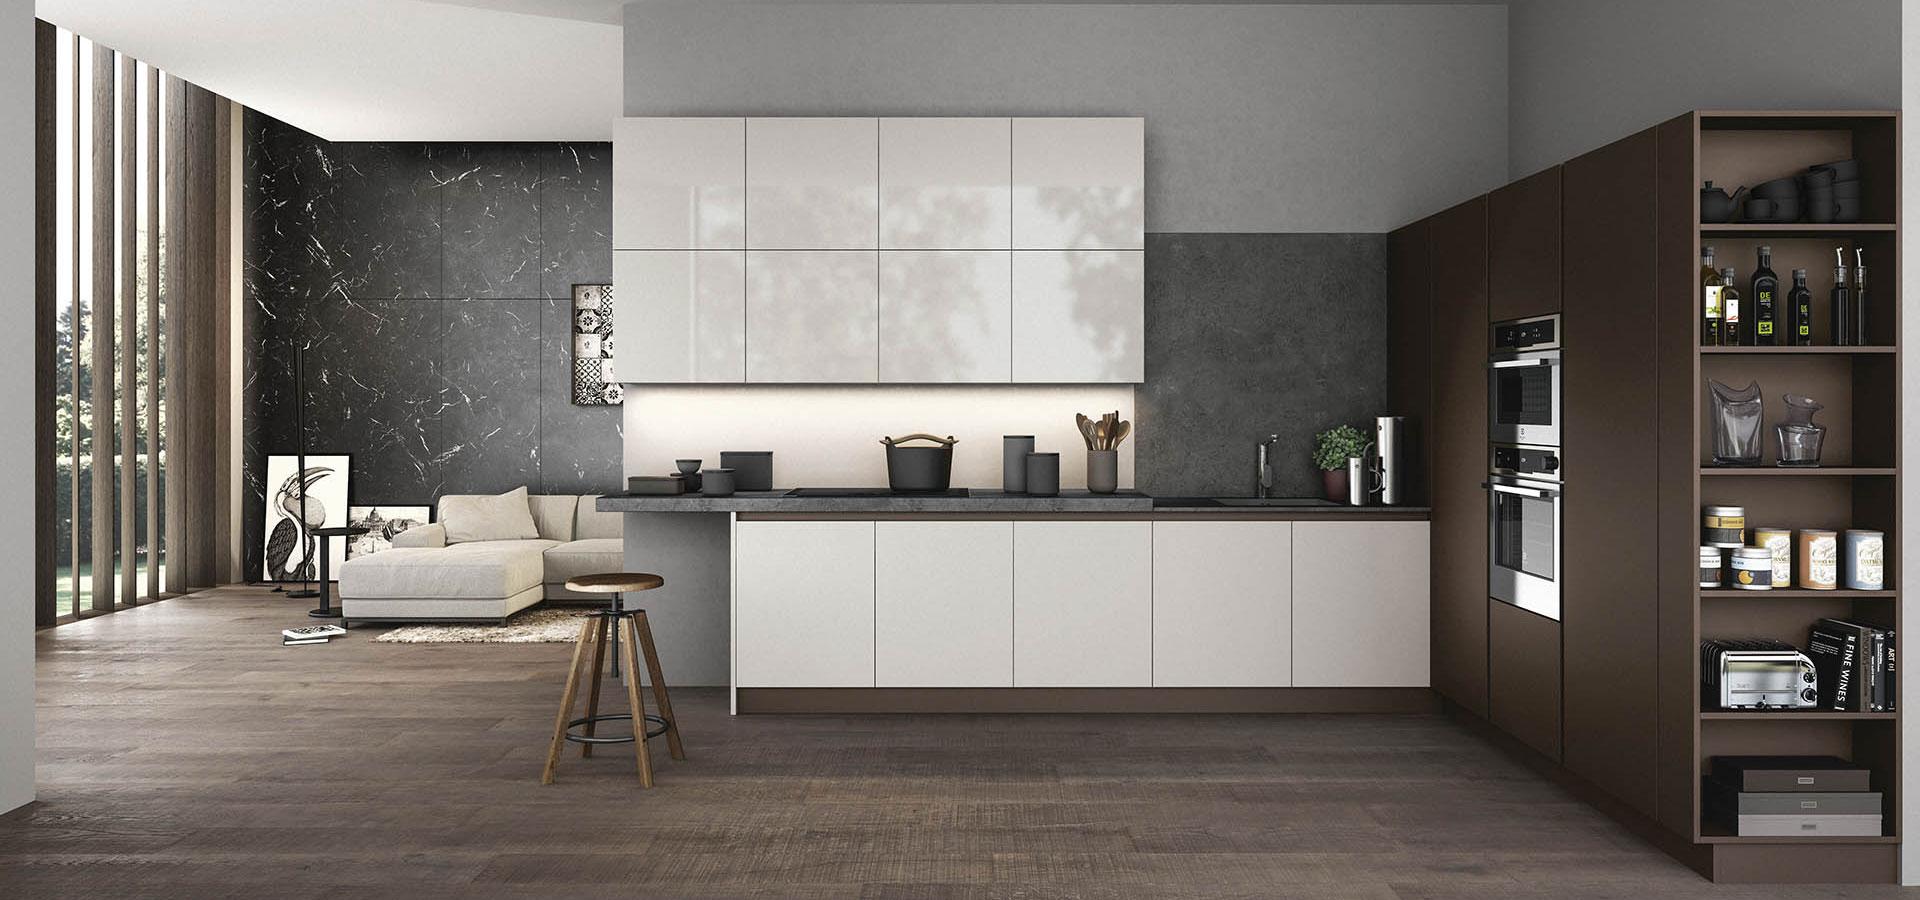 Arredo3 cucina time nuove finiture e materiali for Cucina arreda